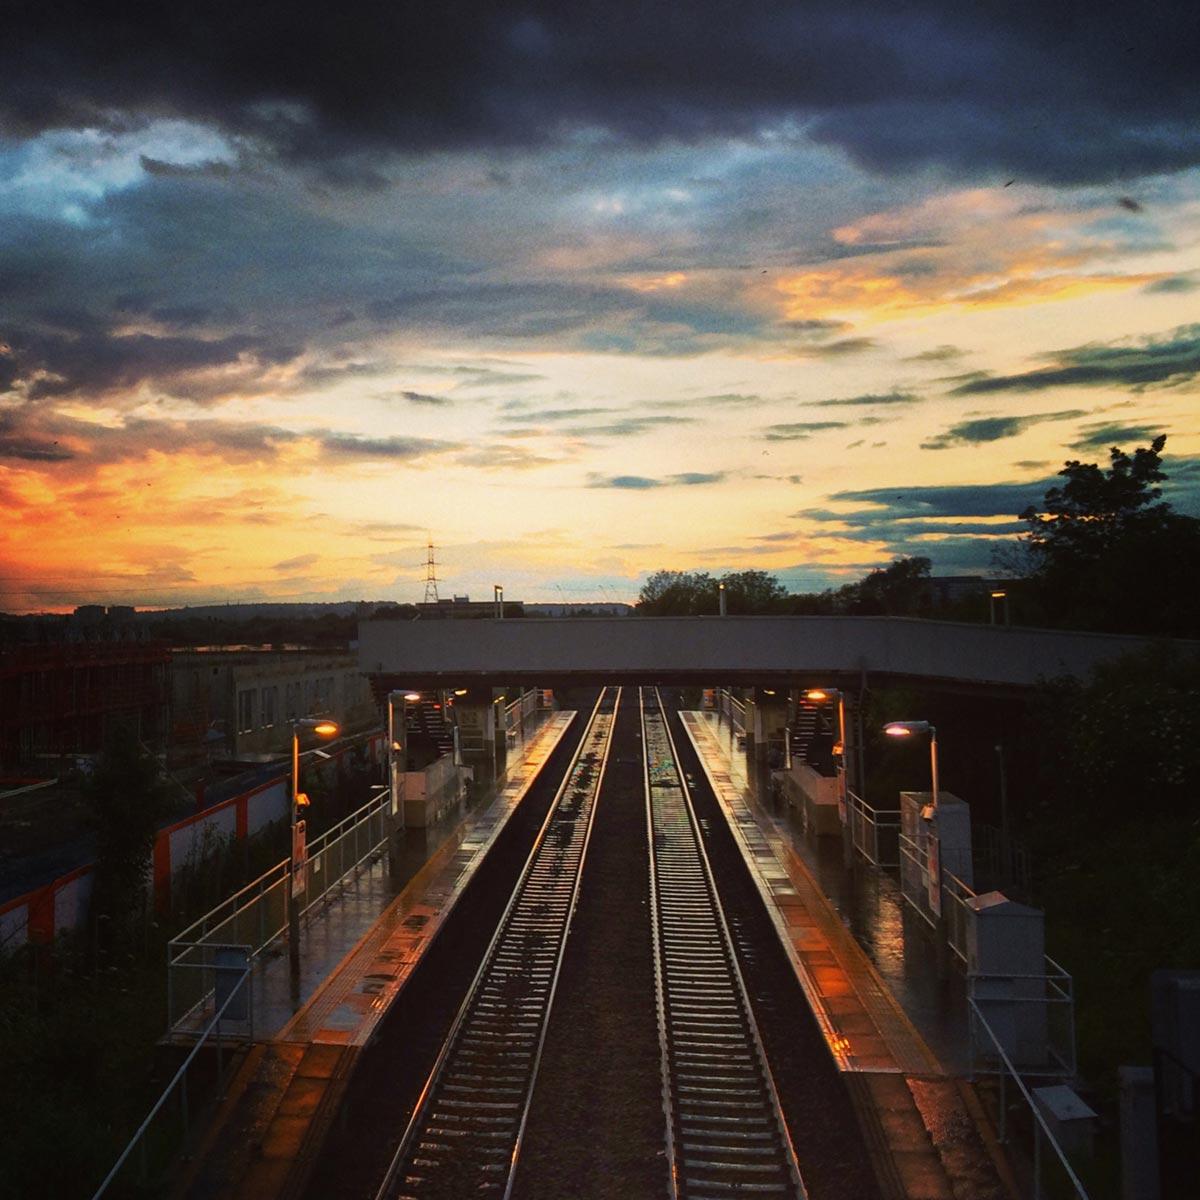 Blackhorse Road Overground Station sunset